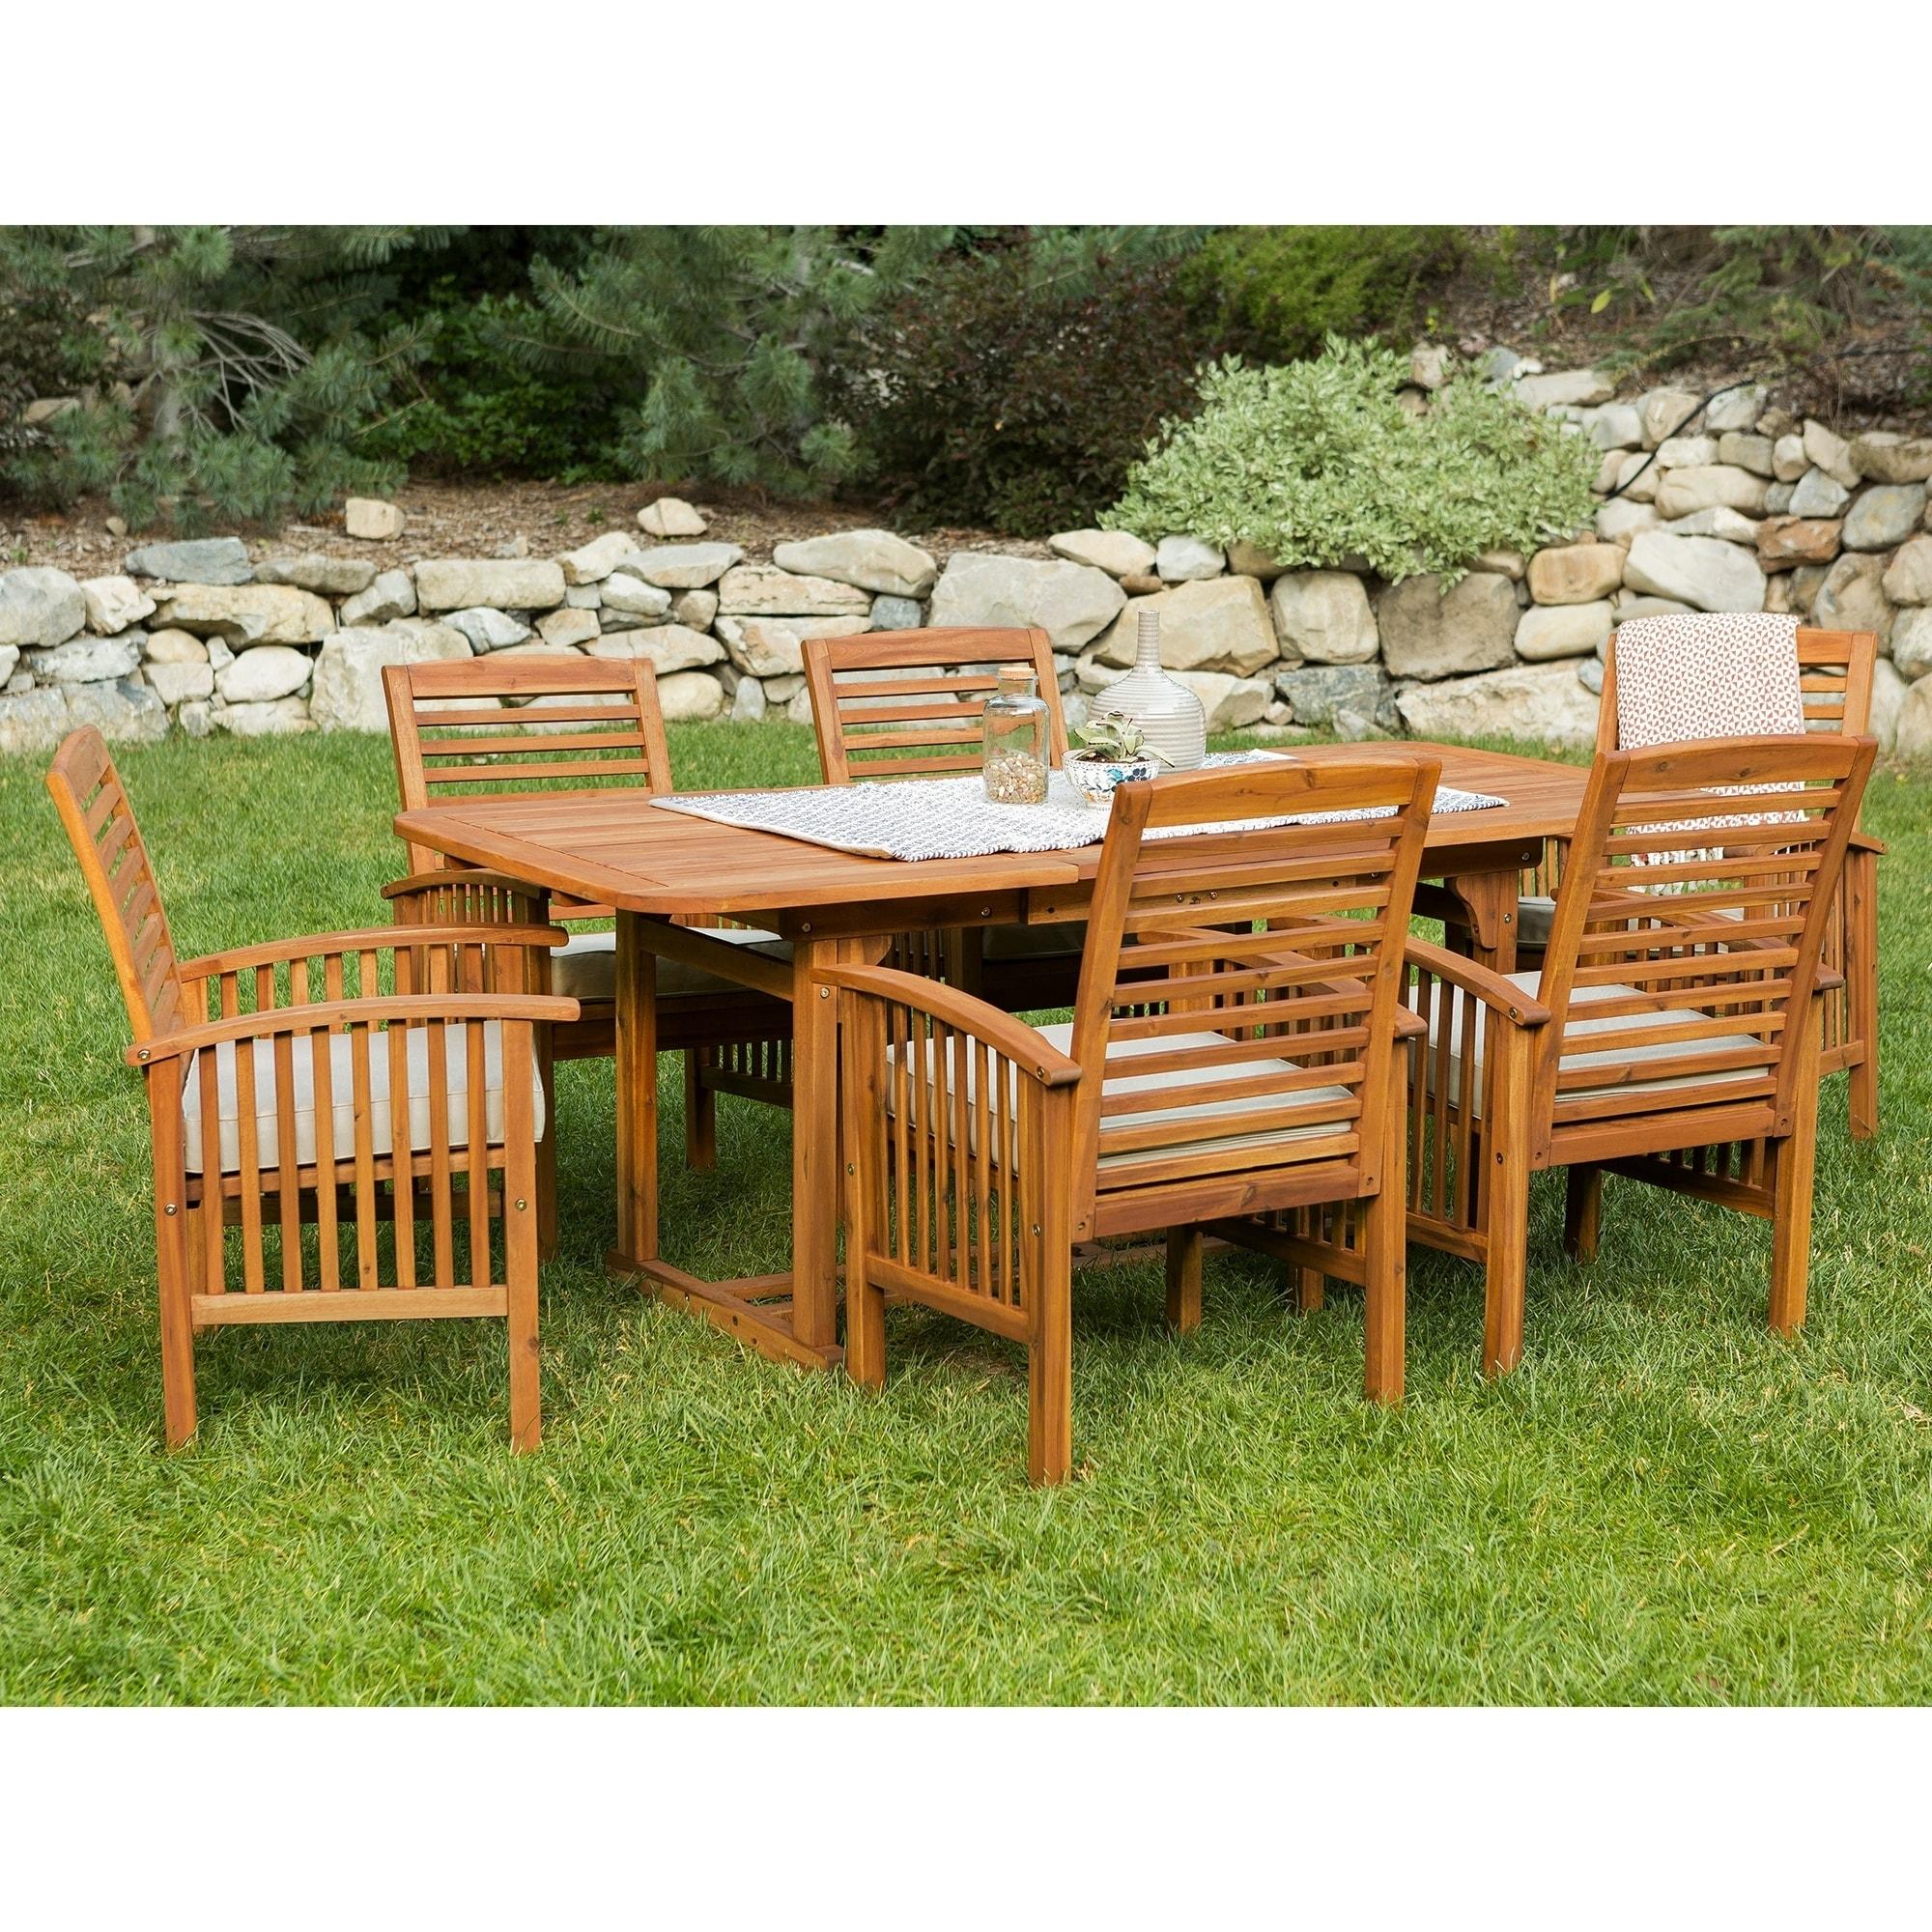 The Gray Barn Bluebird 7 Piece Acacia Wood Patio Dining Set   Free Shipping  Today   Overstock   15069974